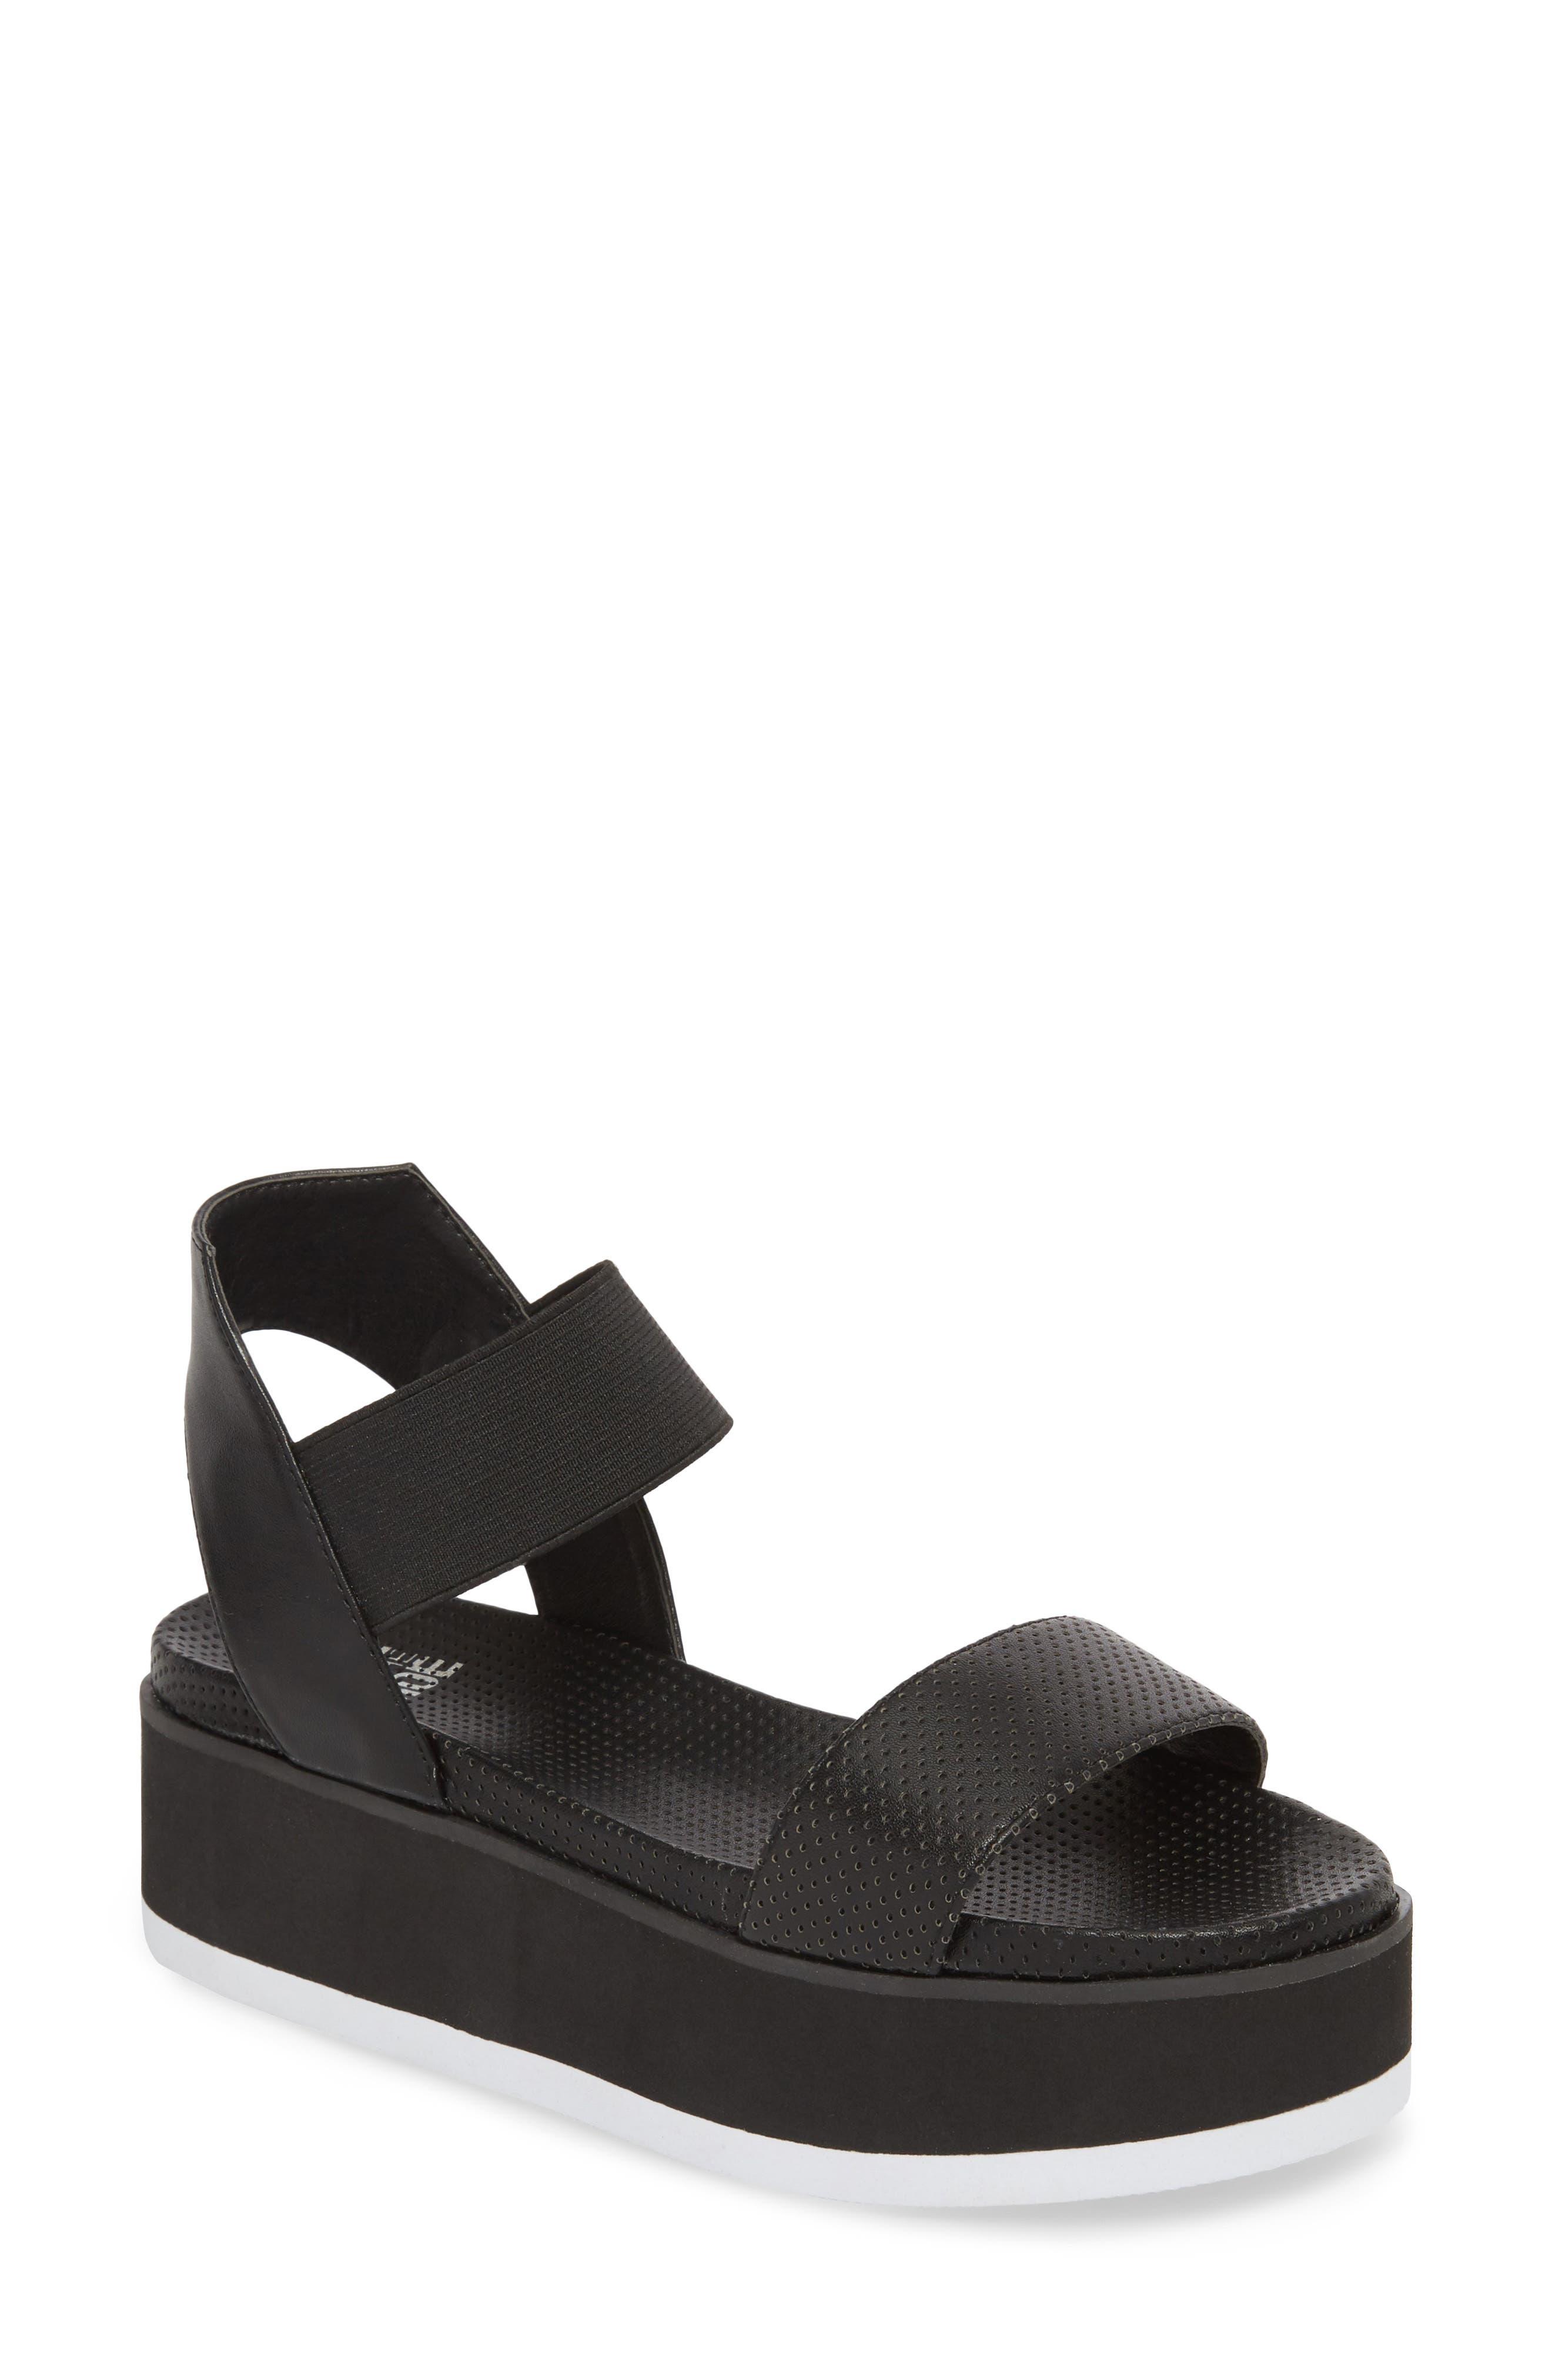 Josie Perforated Platform Sandal,                             Main thumbnail 1, color,                             BLACK